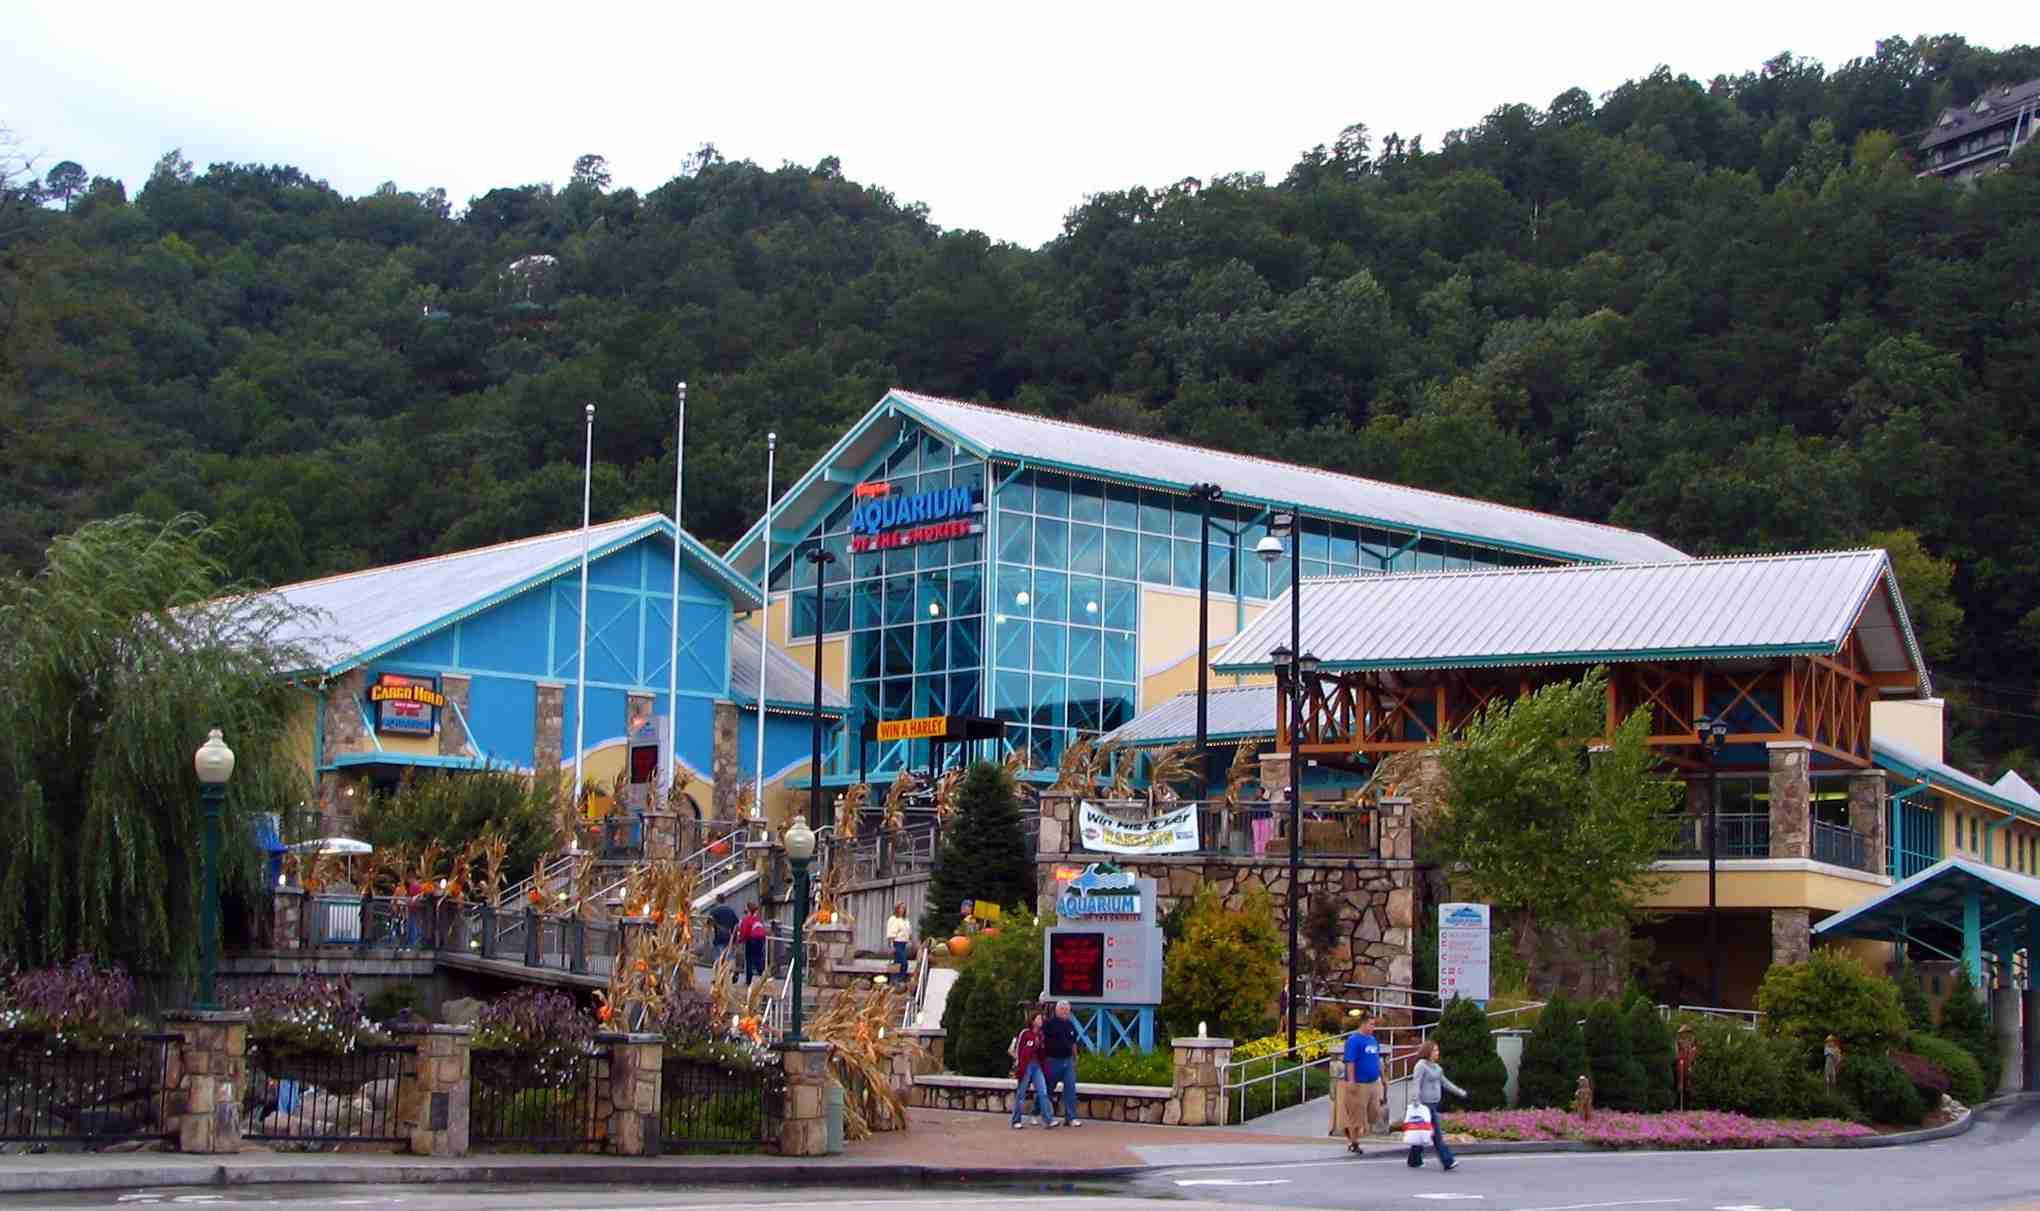 Ripley's aquarium in tennessee